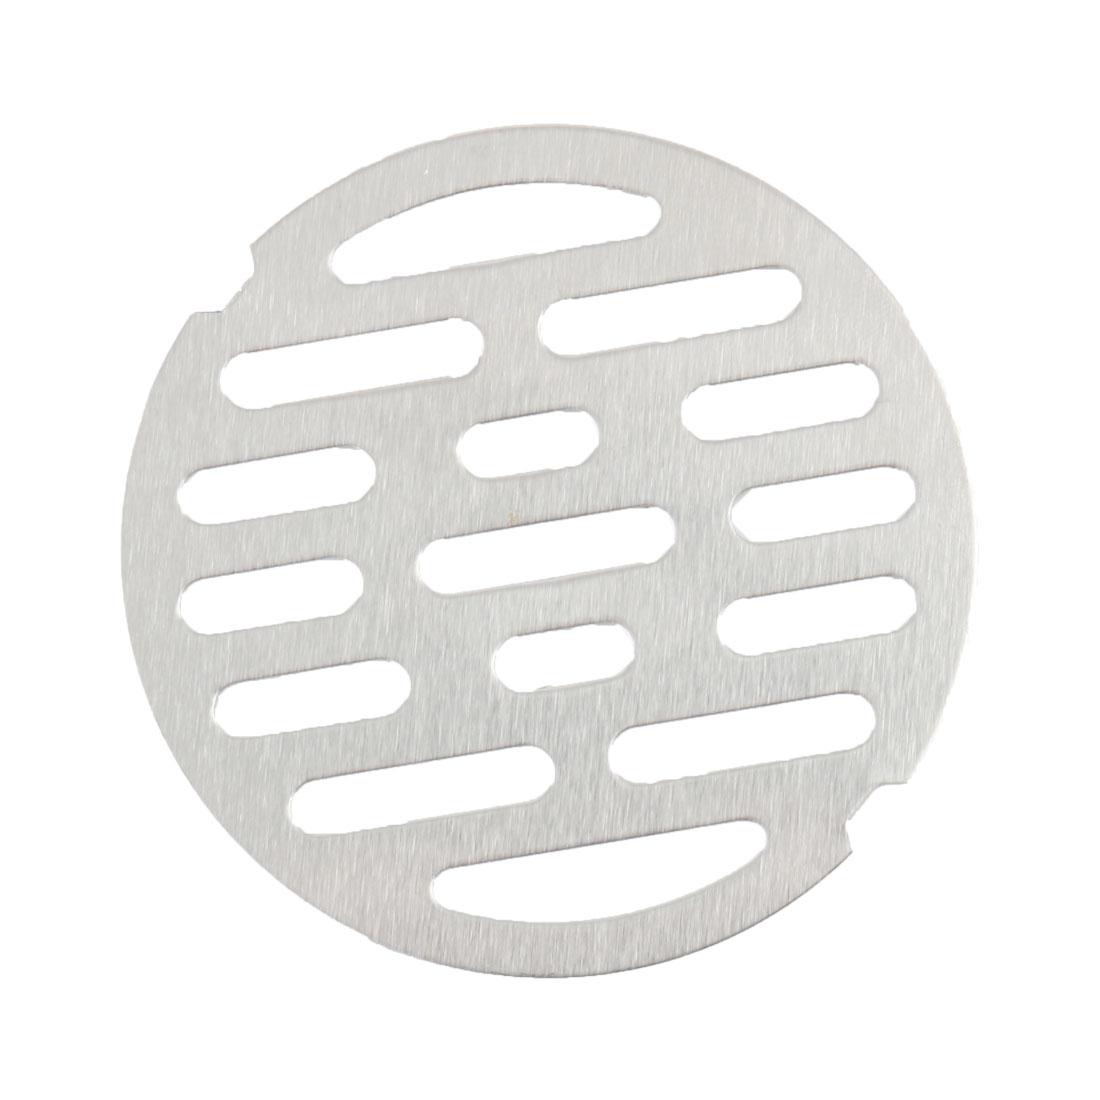 "2.8"" Snap-in Floor Drain Cover Hair Catcher Sink Filter Strainer Stopper"